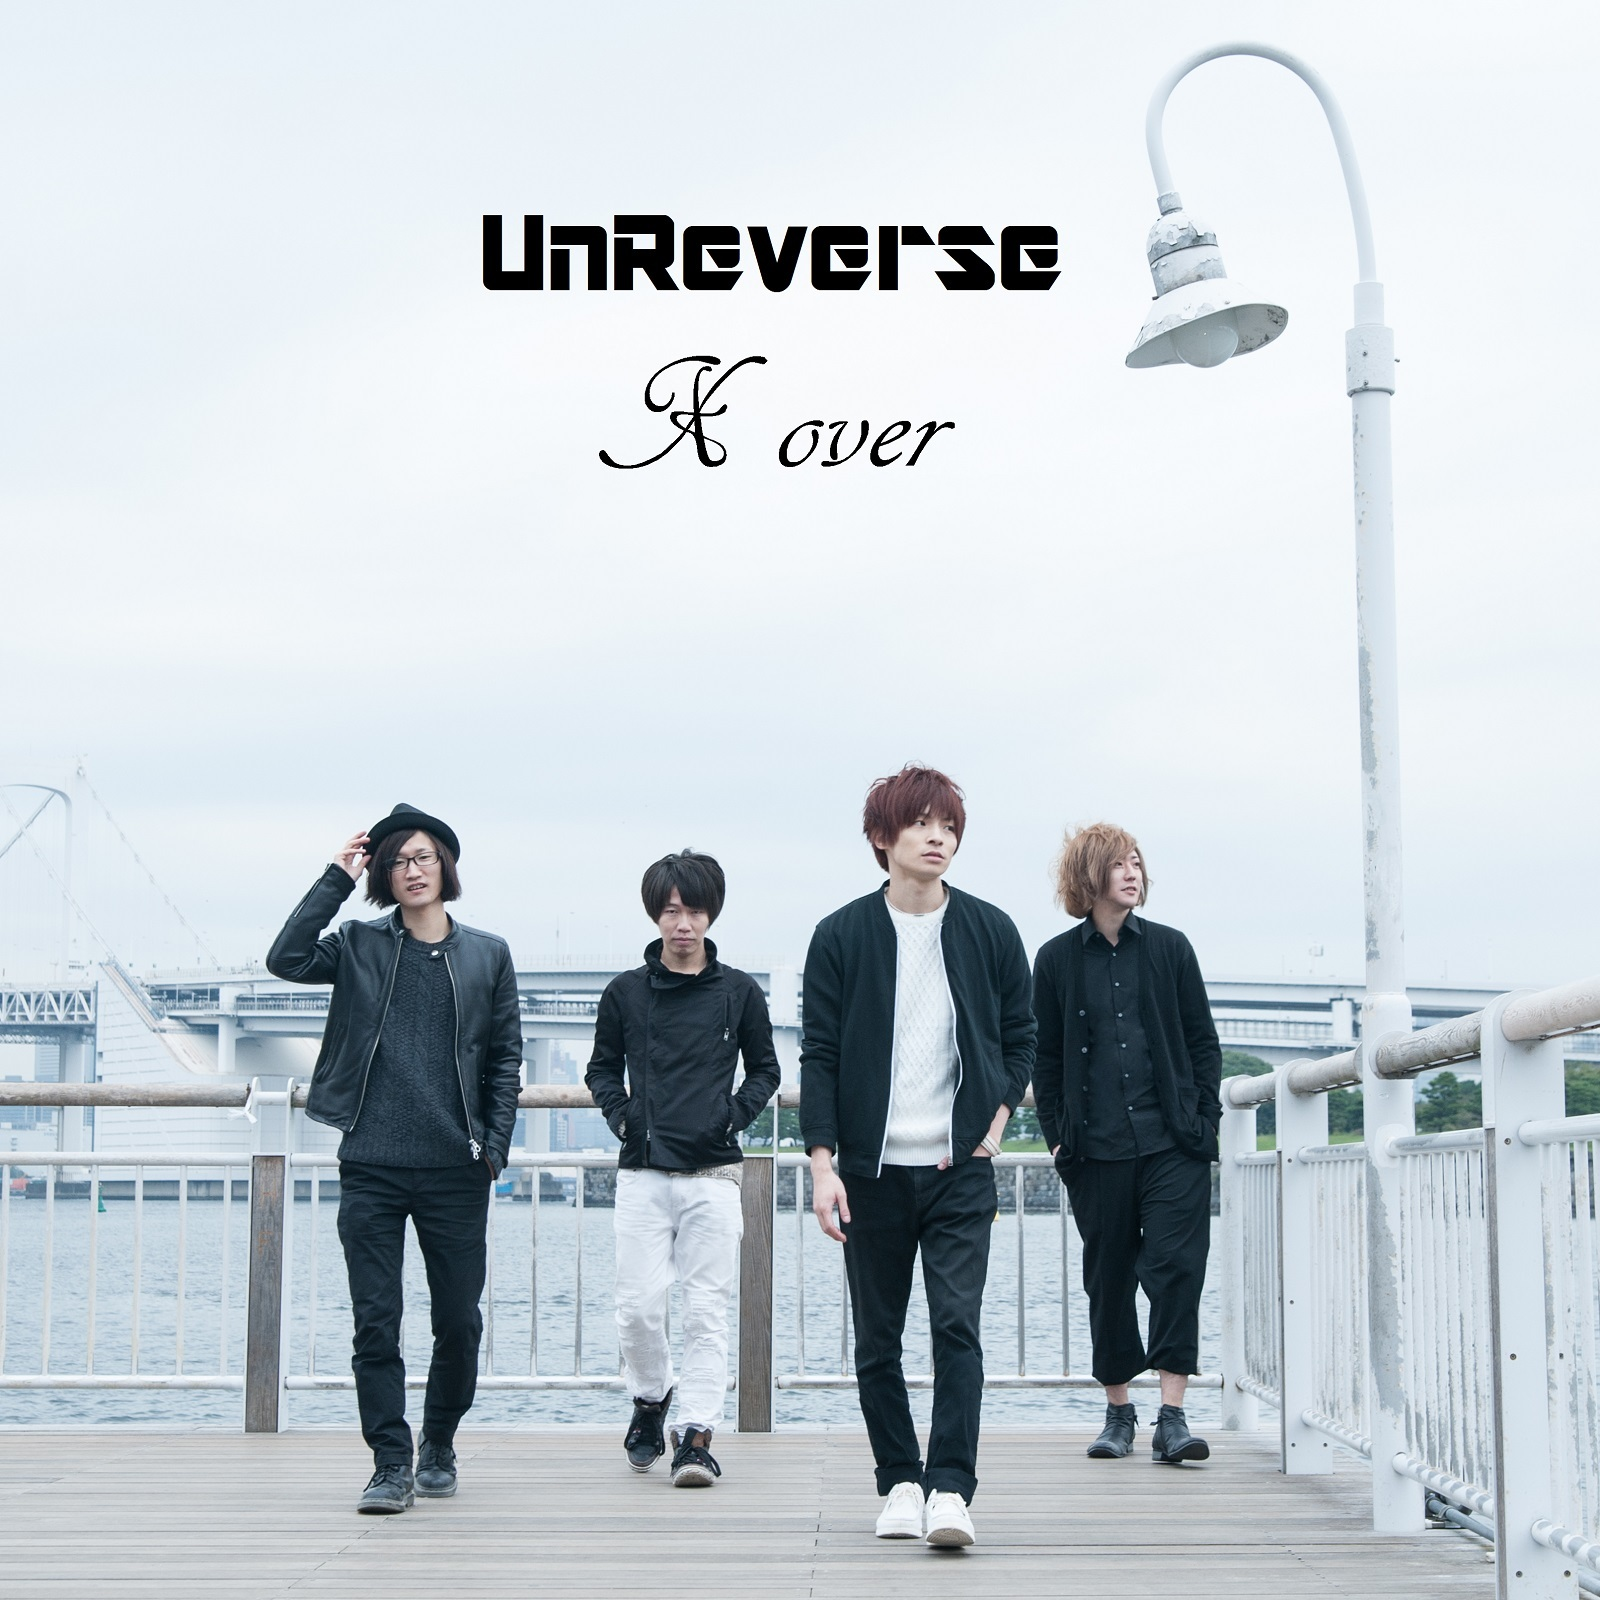 UnReverse